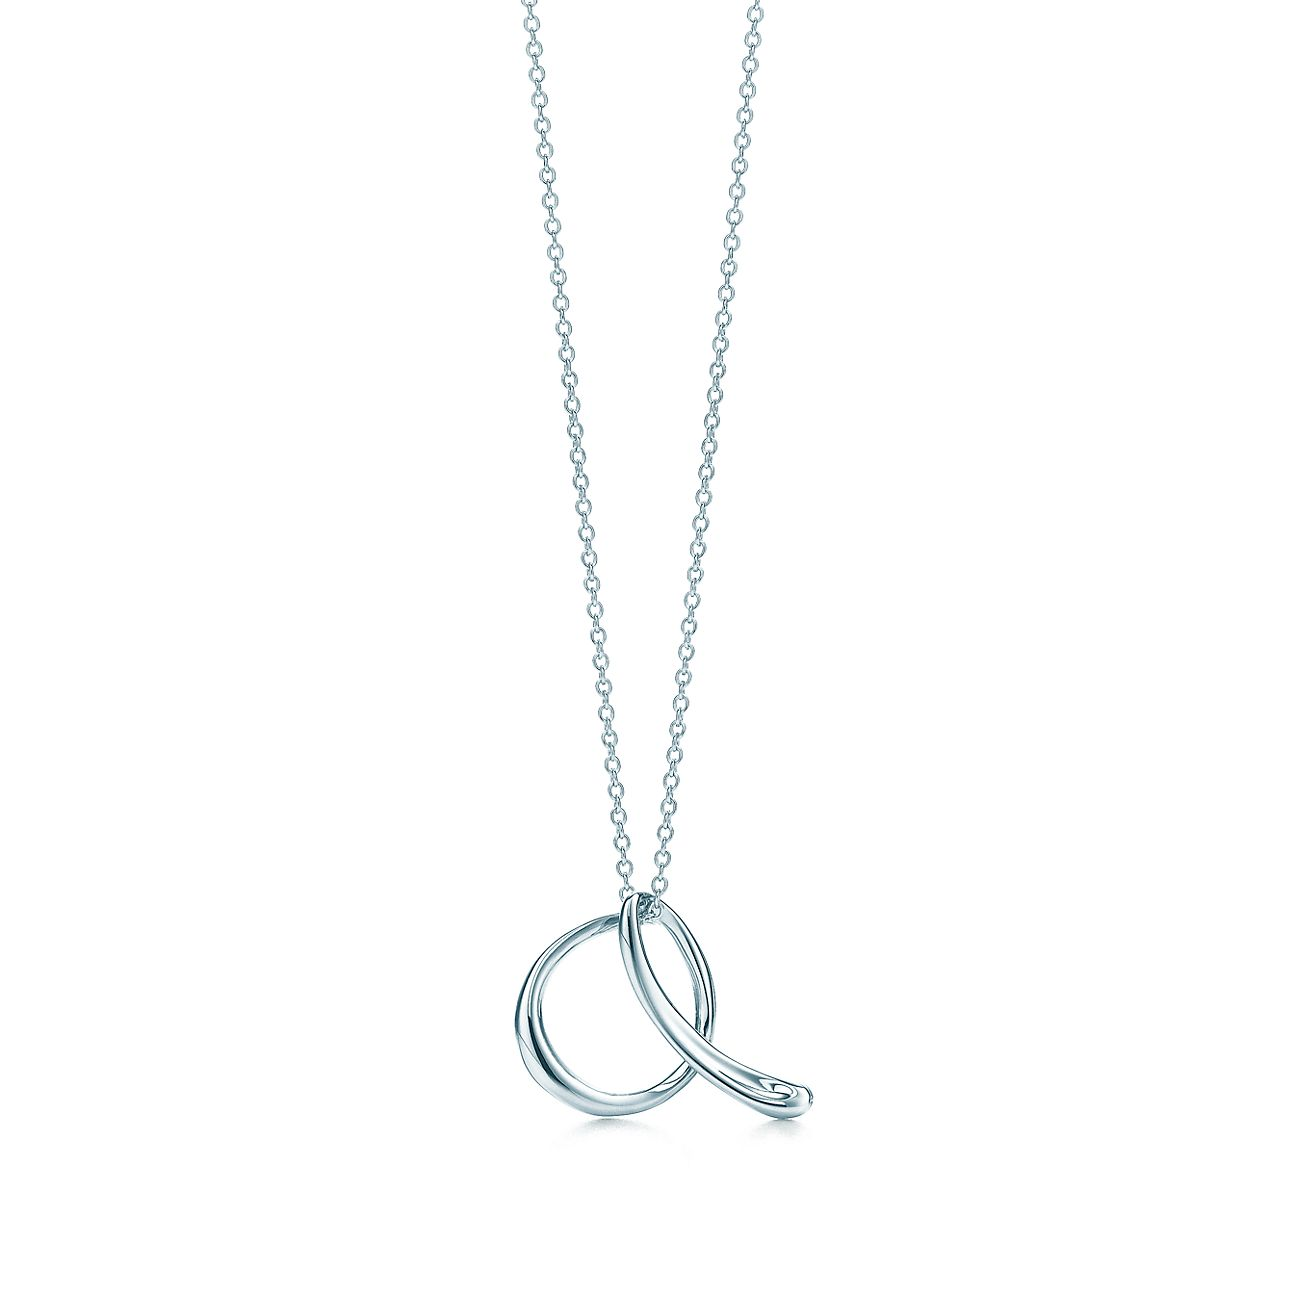 Elsa peretti letter pendant sterling silver small letters a z browse necklaces pendants elsa perettiletter a mozeypictures Gallery